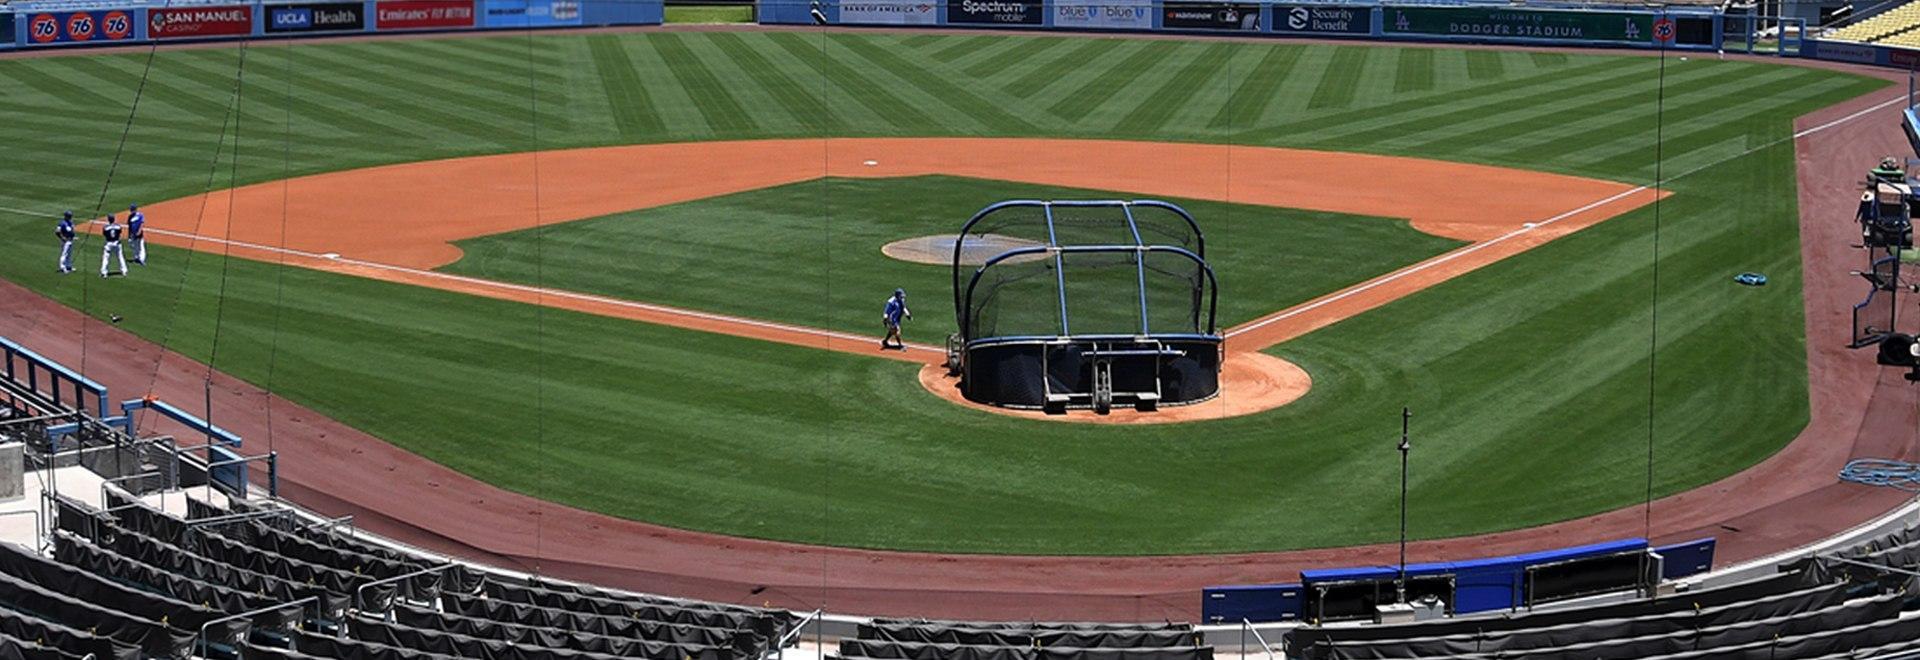 Tampa Bay - LA Dodgers. World Series Game 4